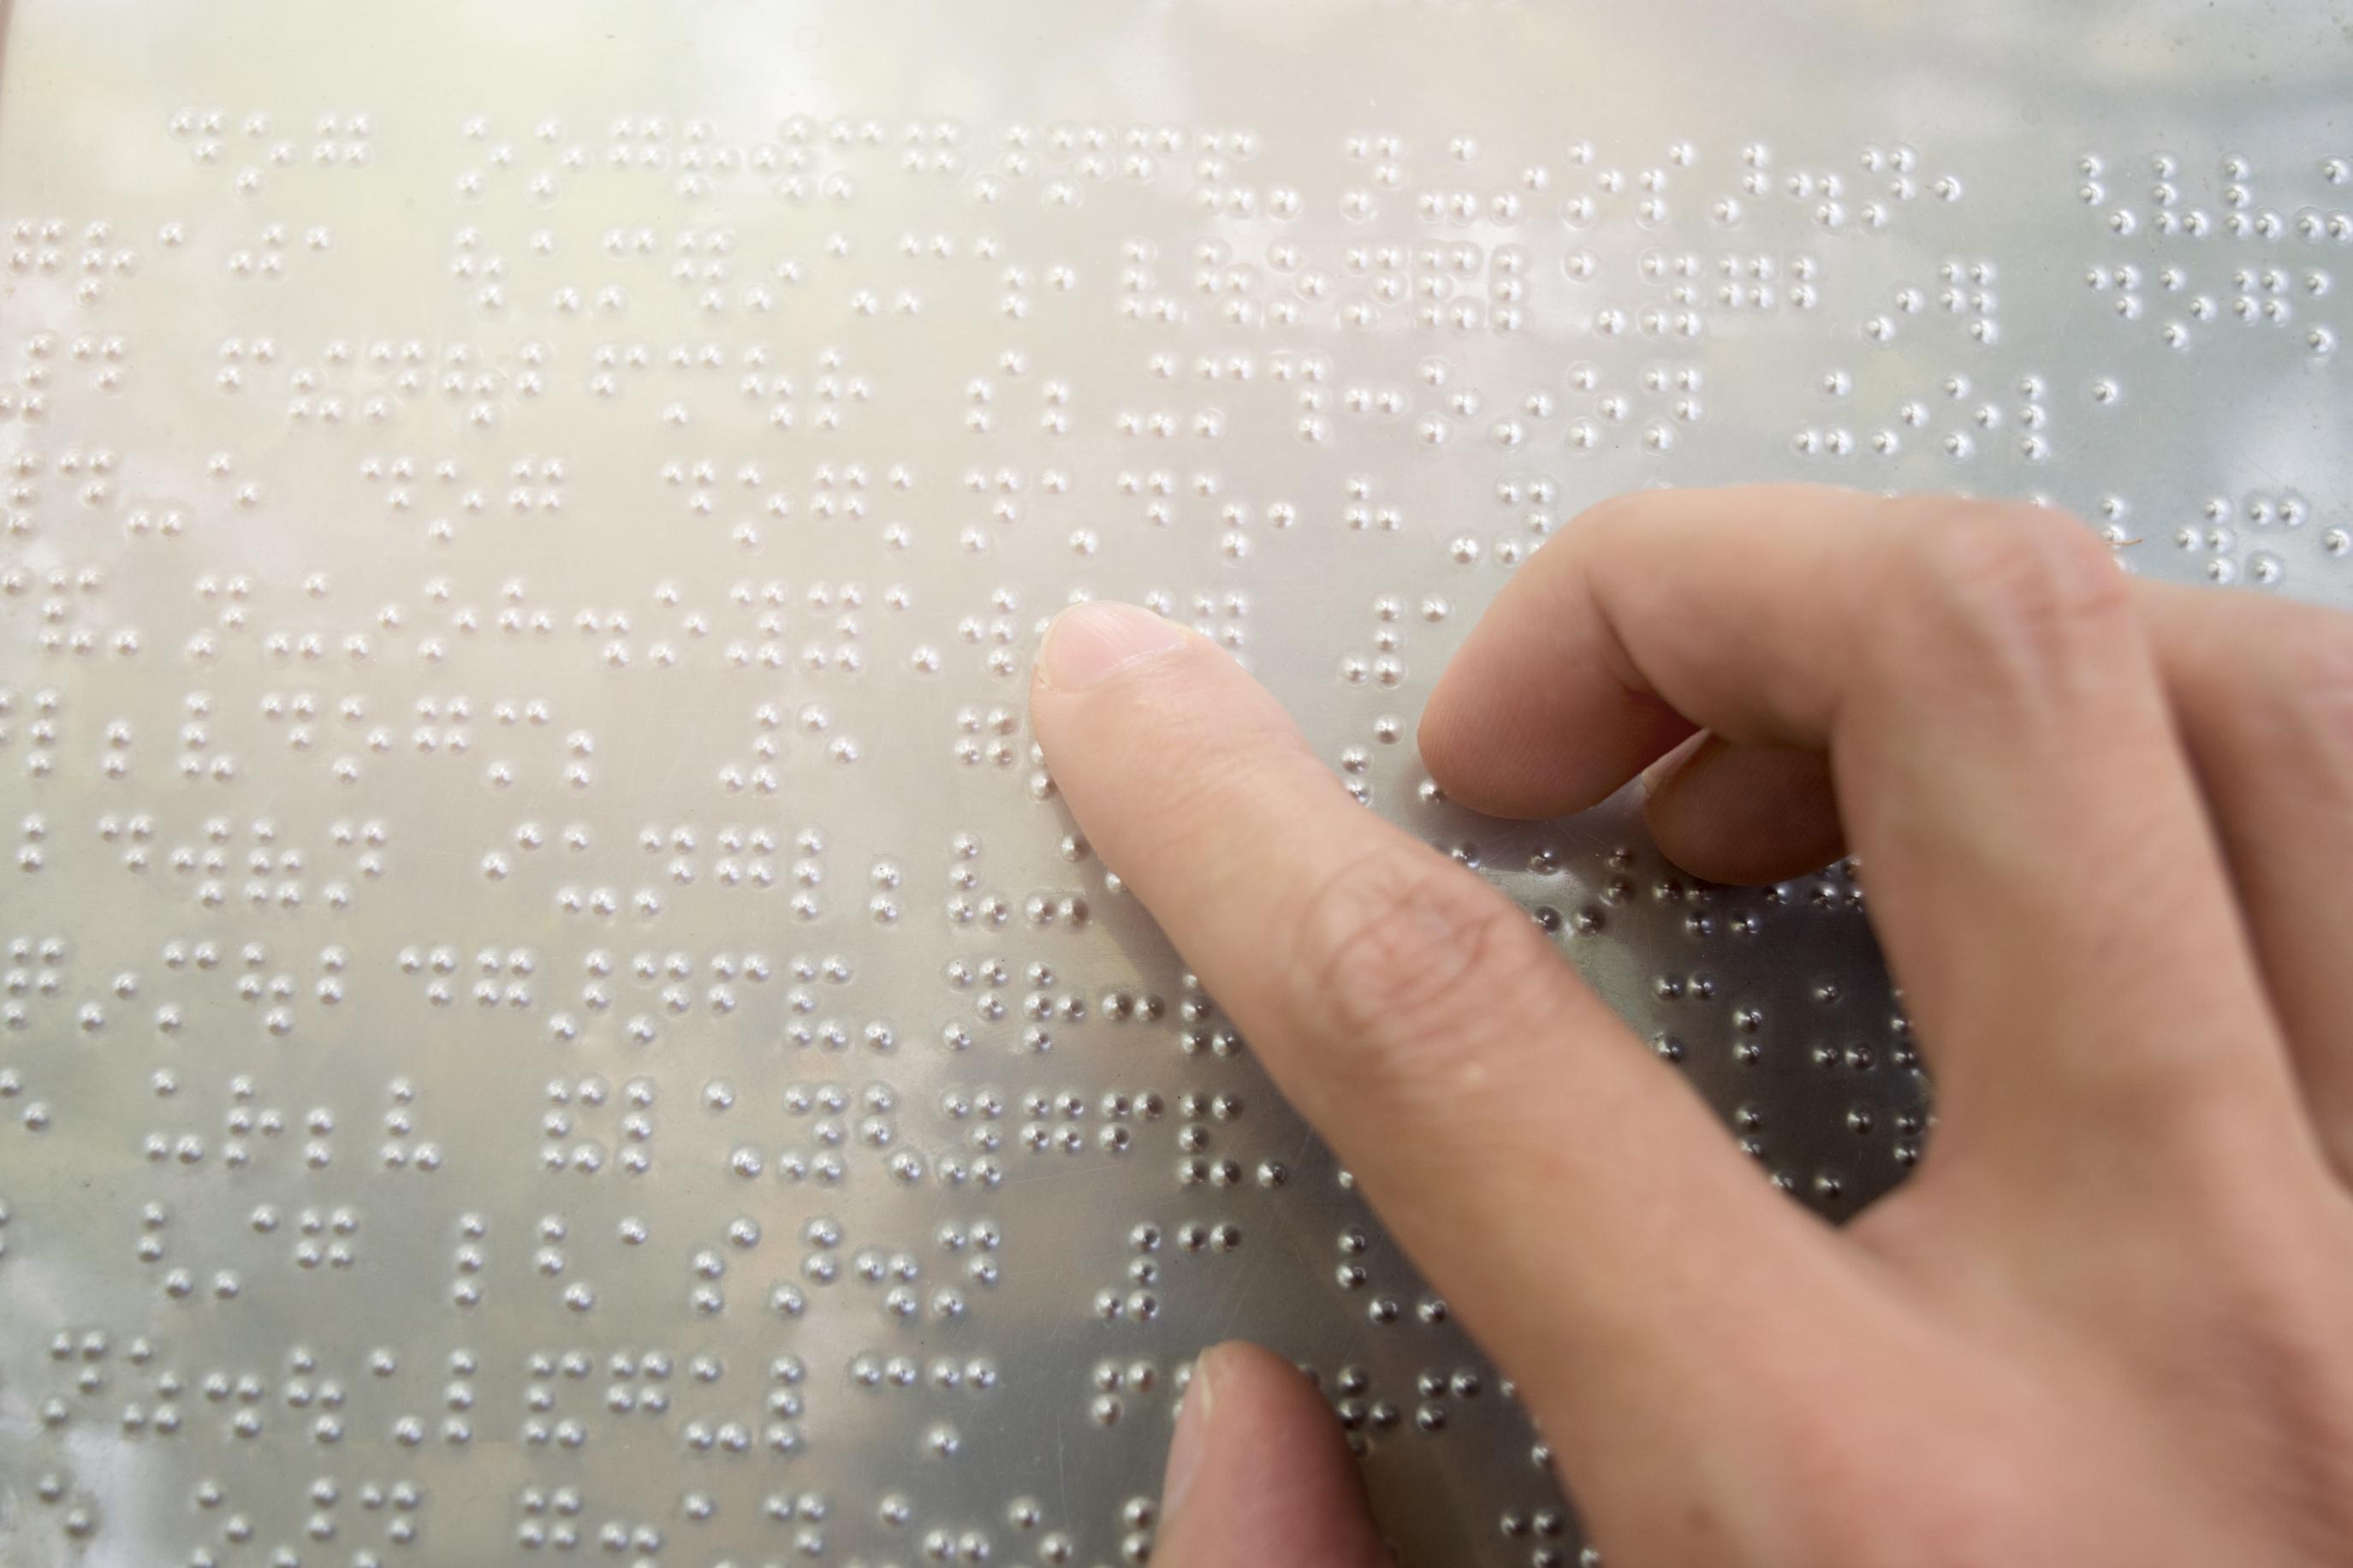 braille hero image